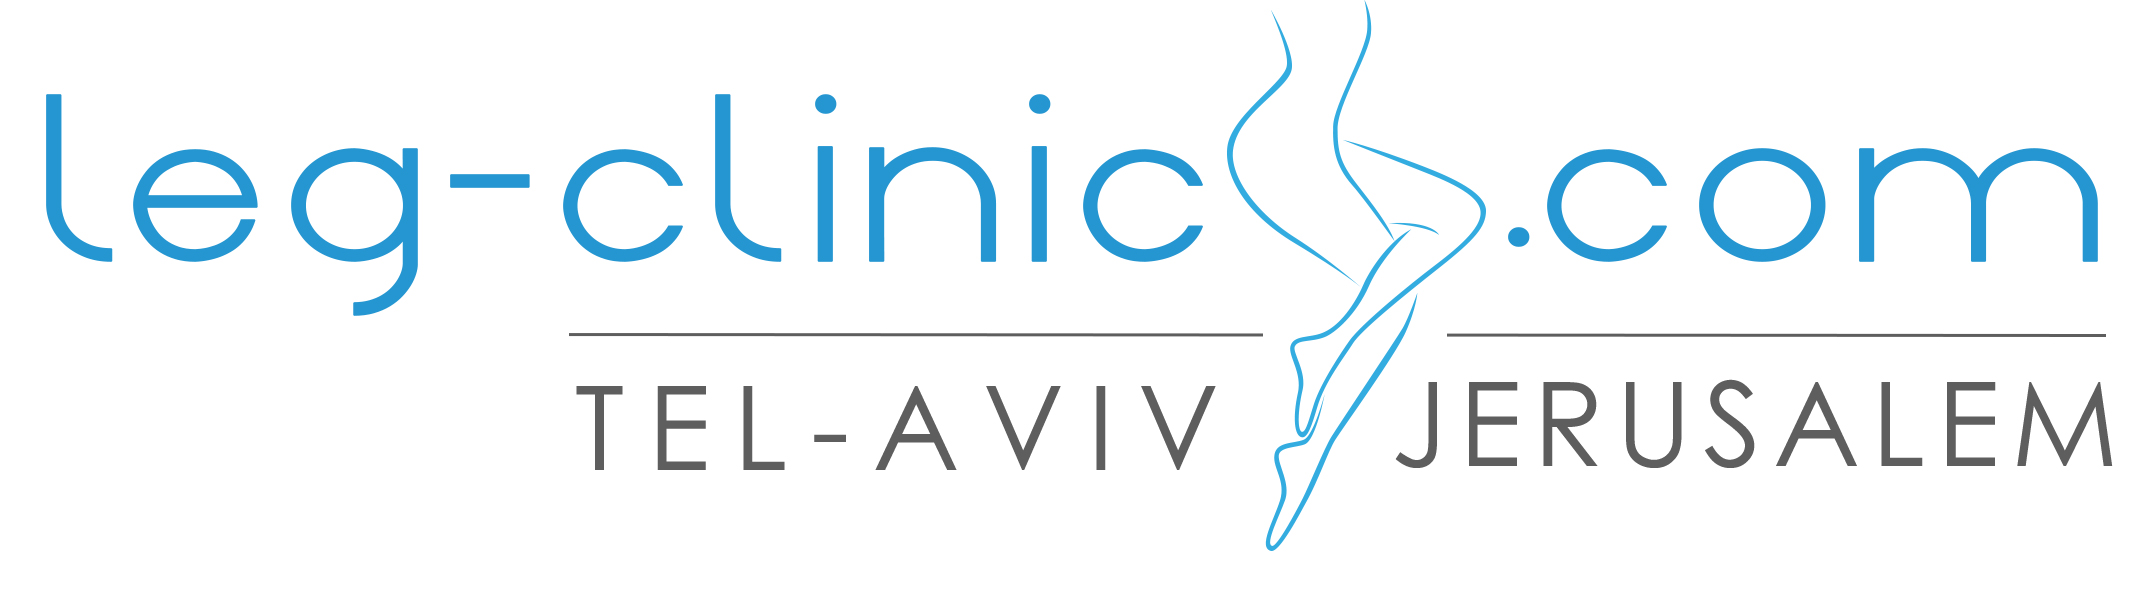 Phlébologue Israel - Docteur David Bouaziz Tel Aviv - Jerusalem